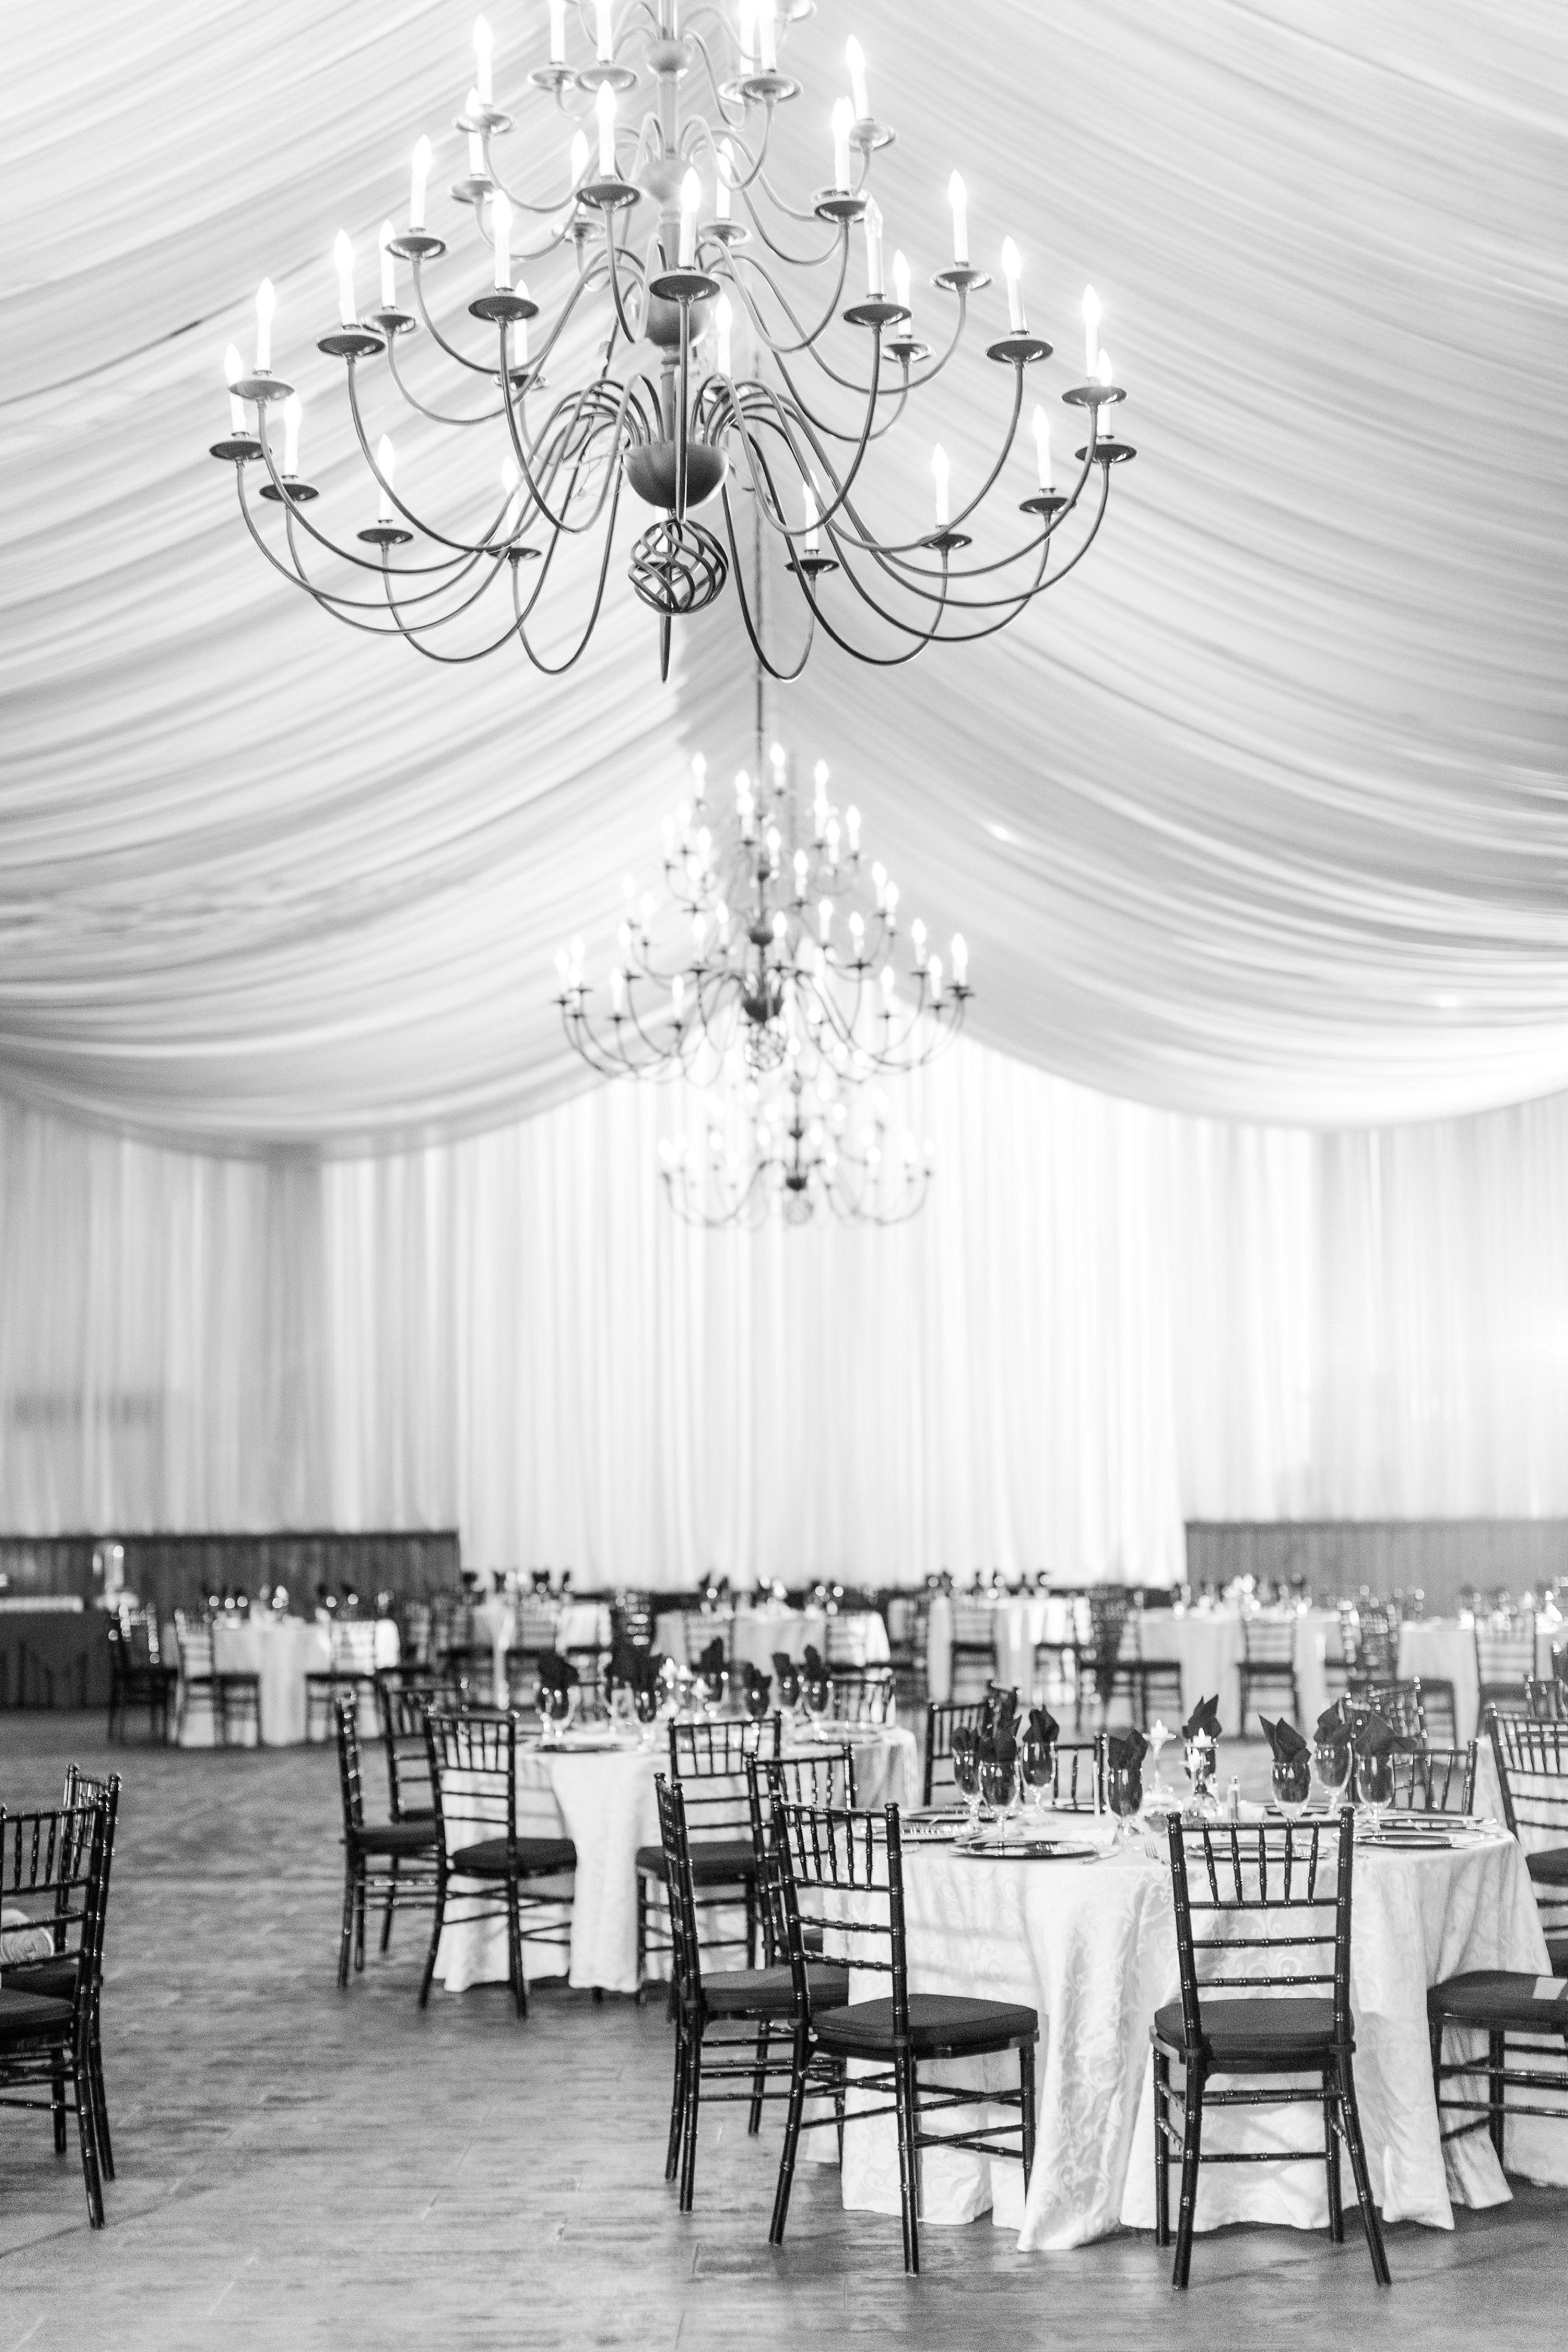 Ryan + Amy   Virginia wedding photographer, Wedding venues ...